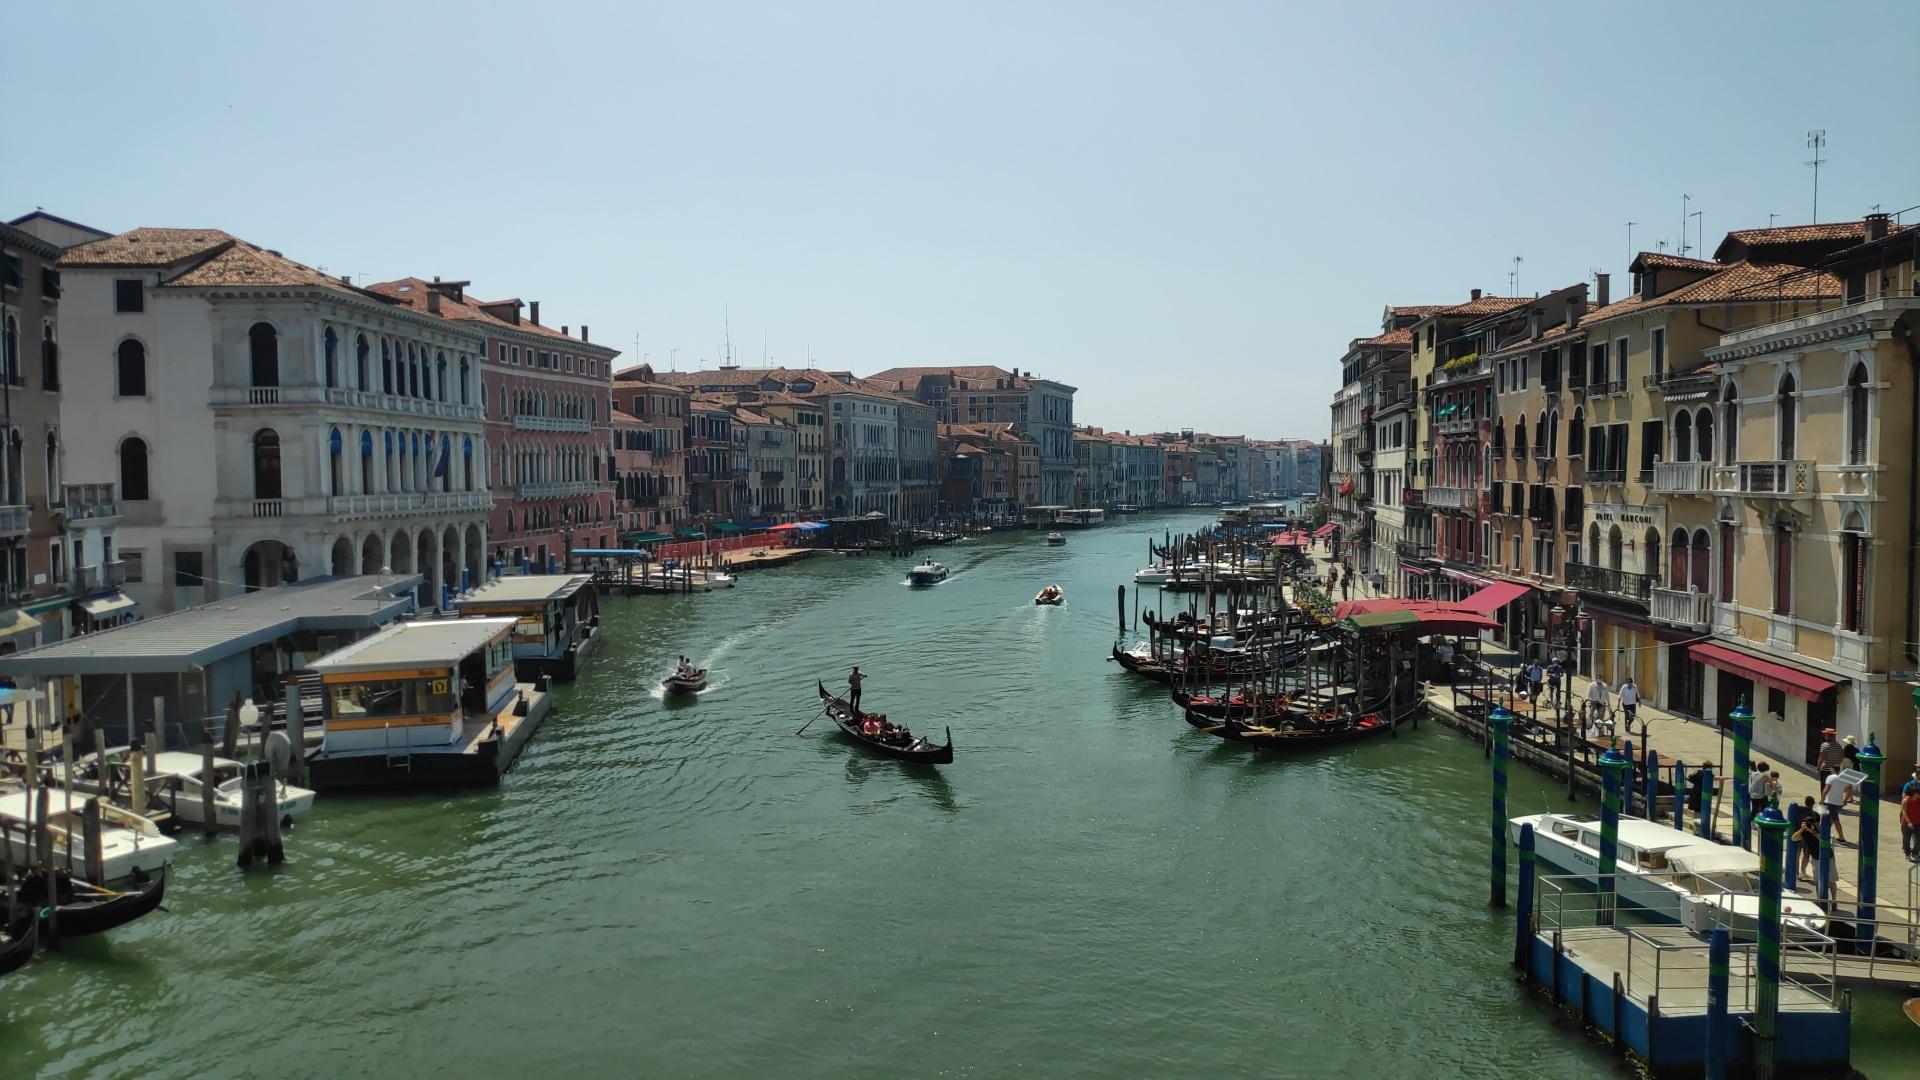 Un dia paseando por venecia